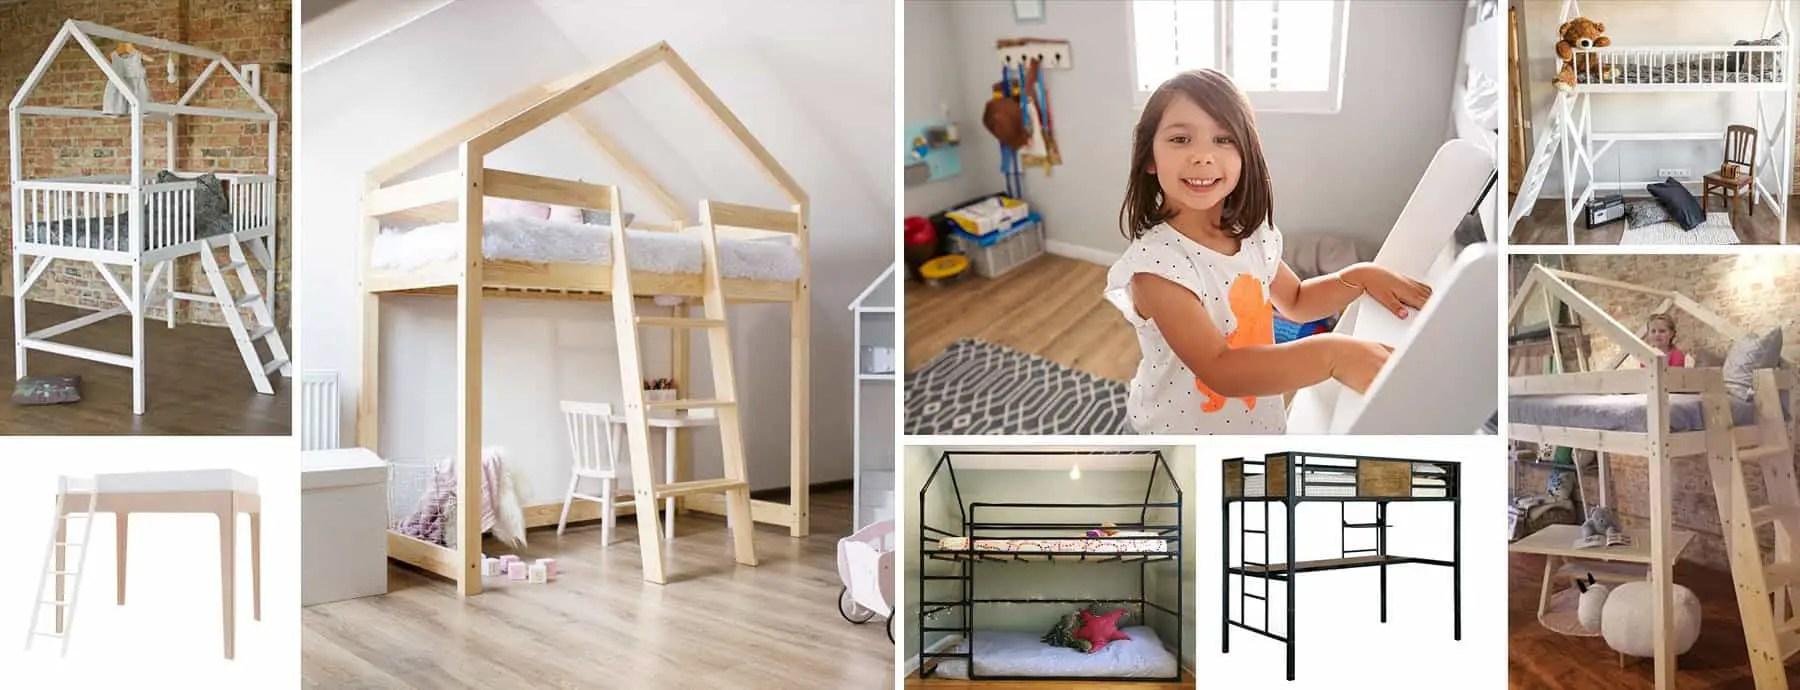 17 Best Loft Beds To Buy Loft Beds Buying Guide 2020 Nursery Kid S Room Decor Ideas My Sleepy Monkey